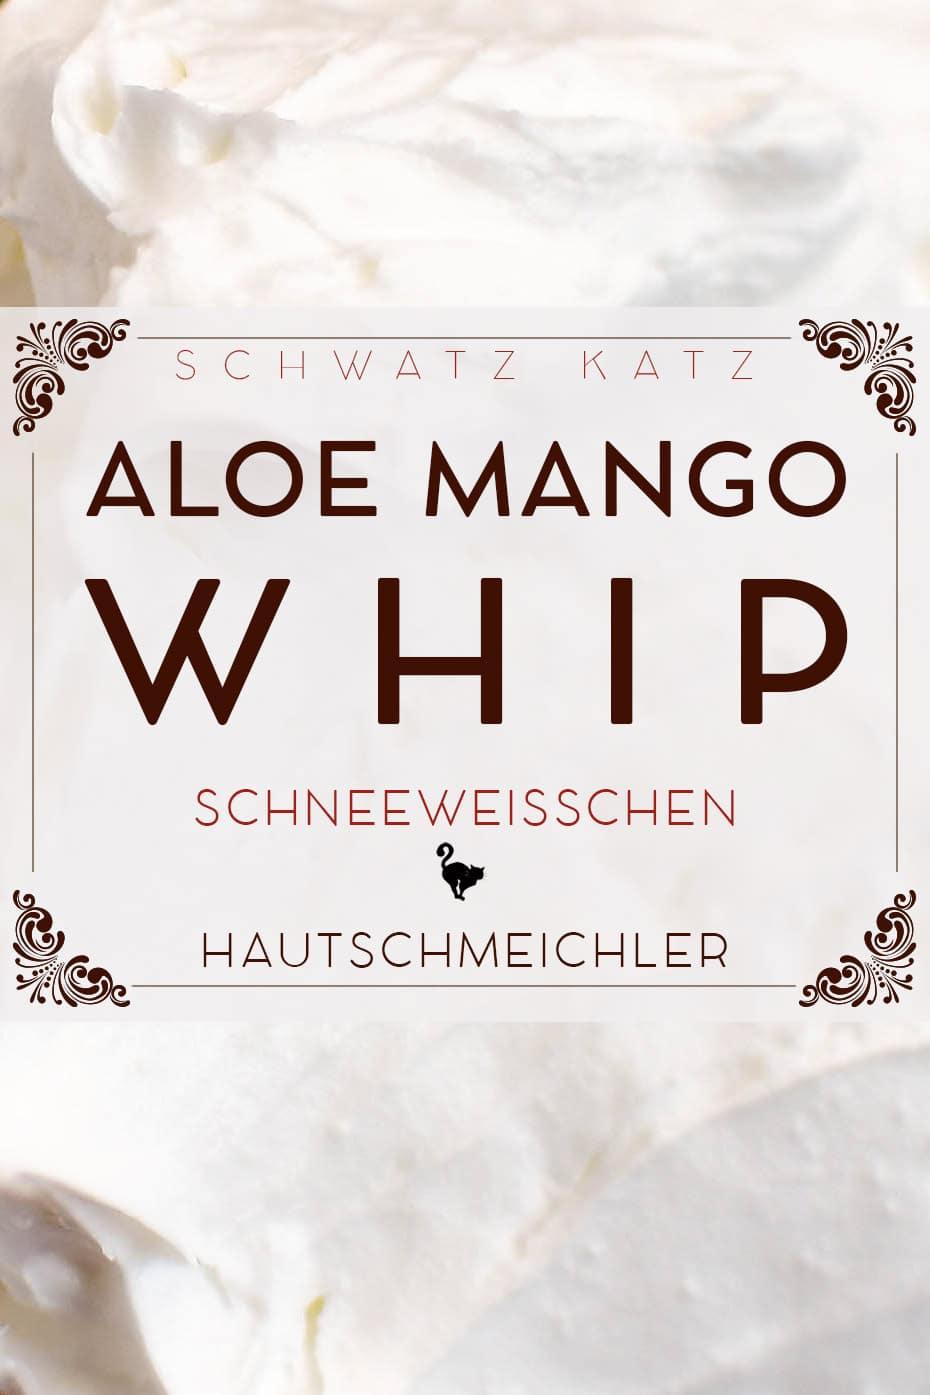 Mango-Aloe Bodysahne »Schneeweißchen« | Schwatz Katz